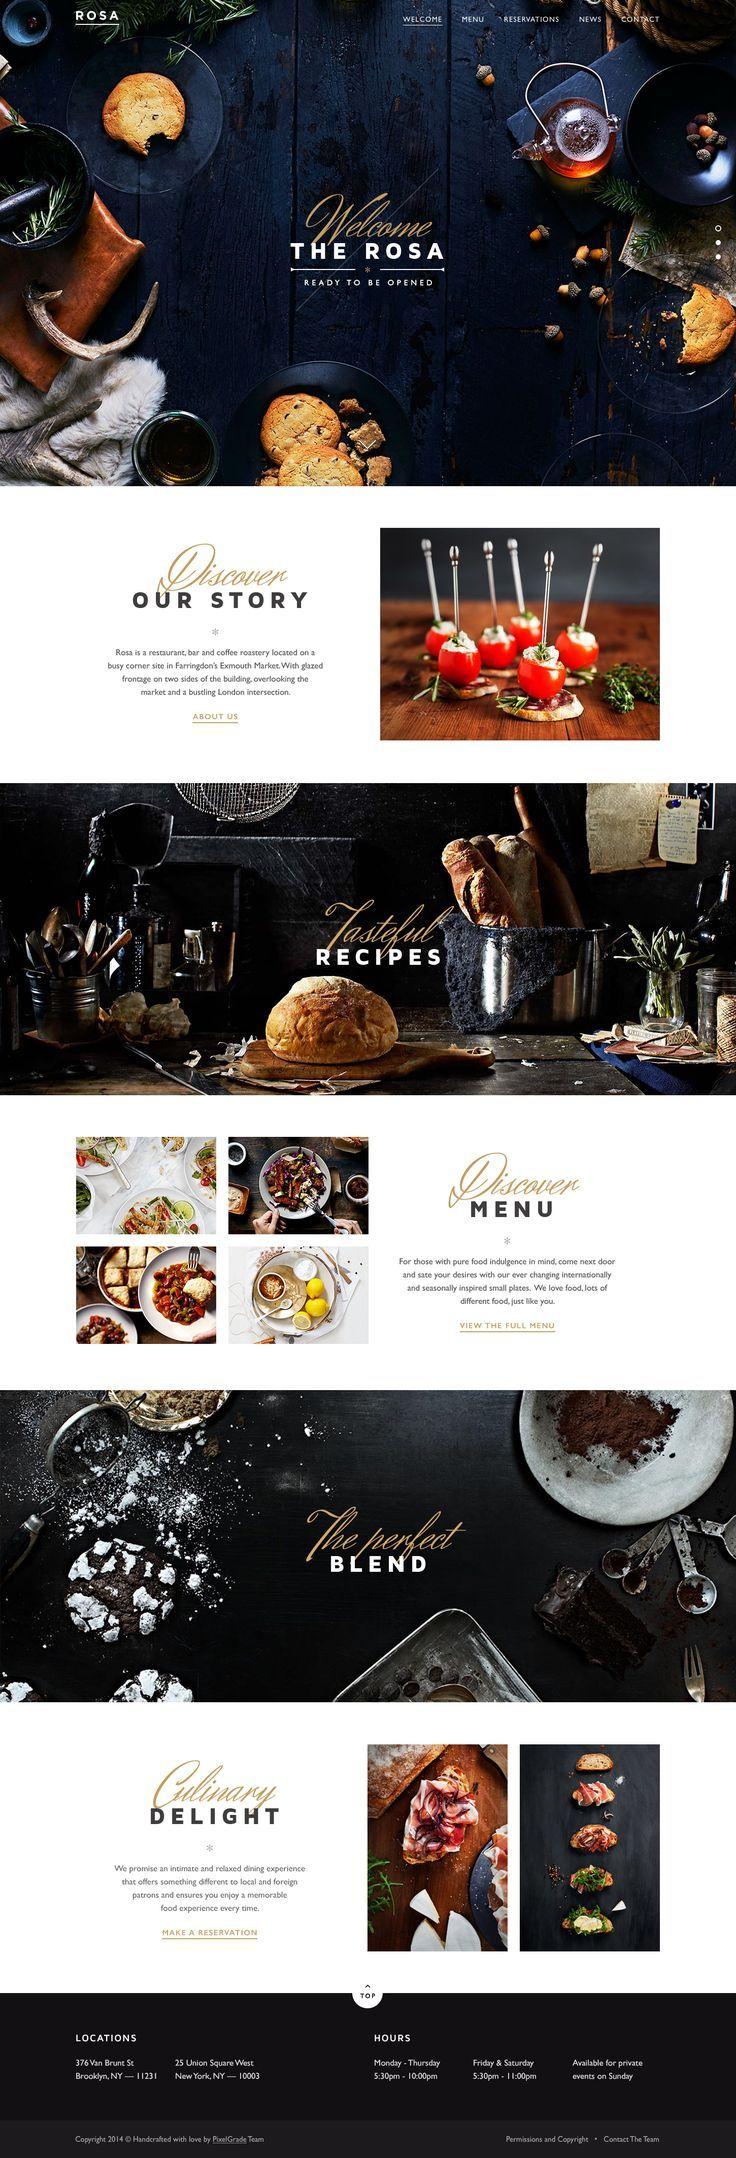 The 25+ best Restaurant website design ideas on Pinterest ...